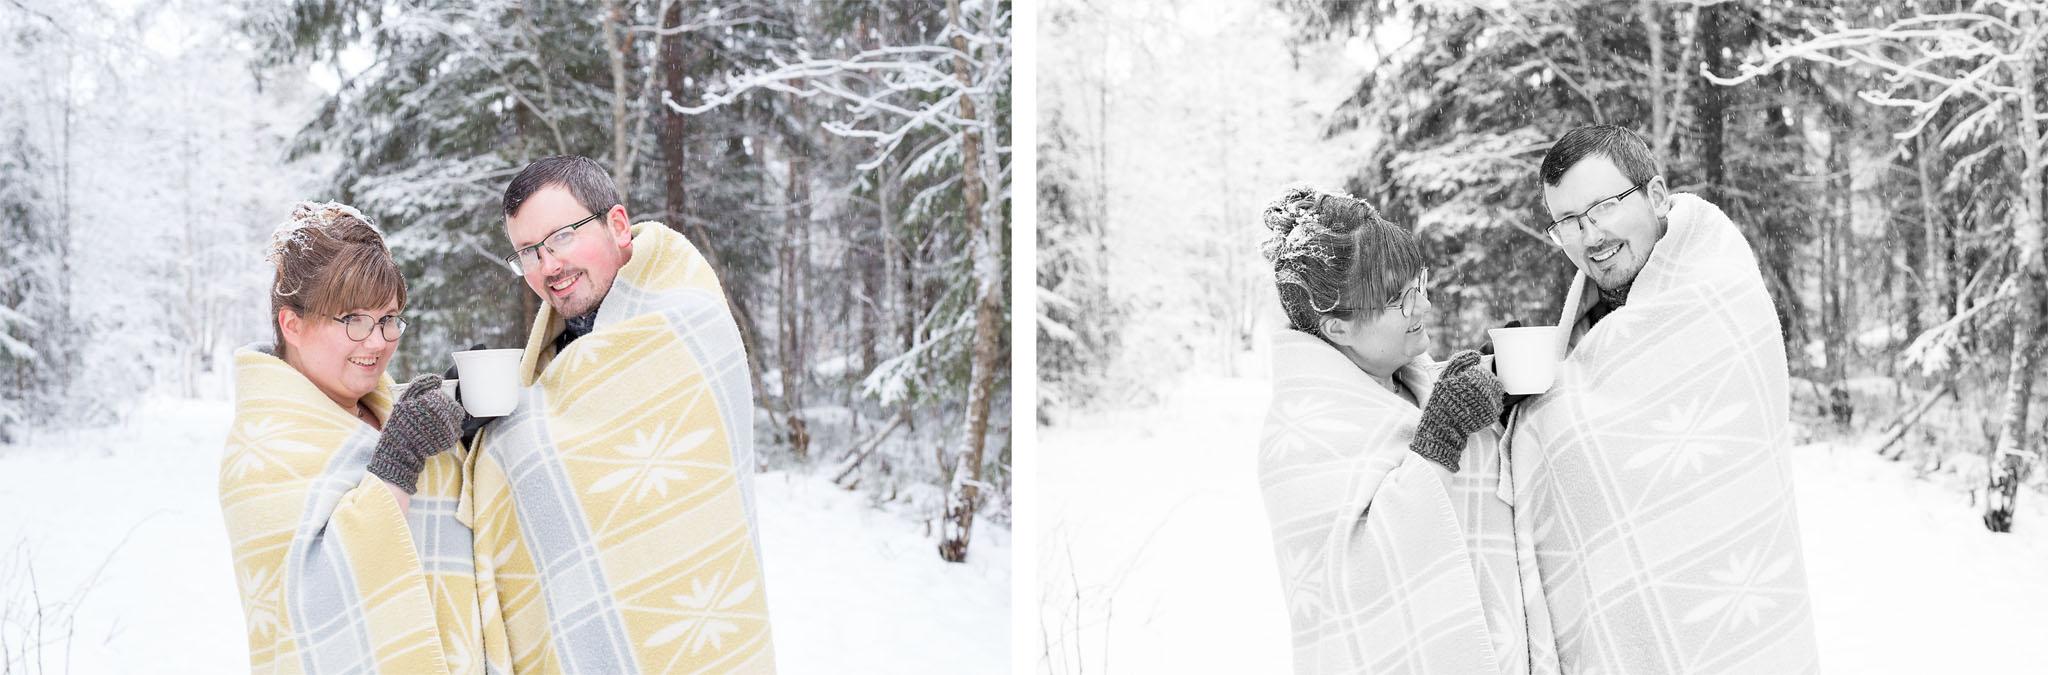 Fotograf_Sabina_Wixner_Bröllop_Hudiksvall_14.jpg